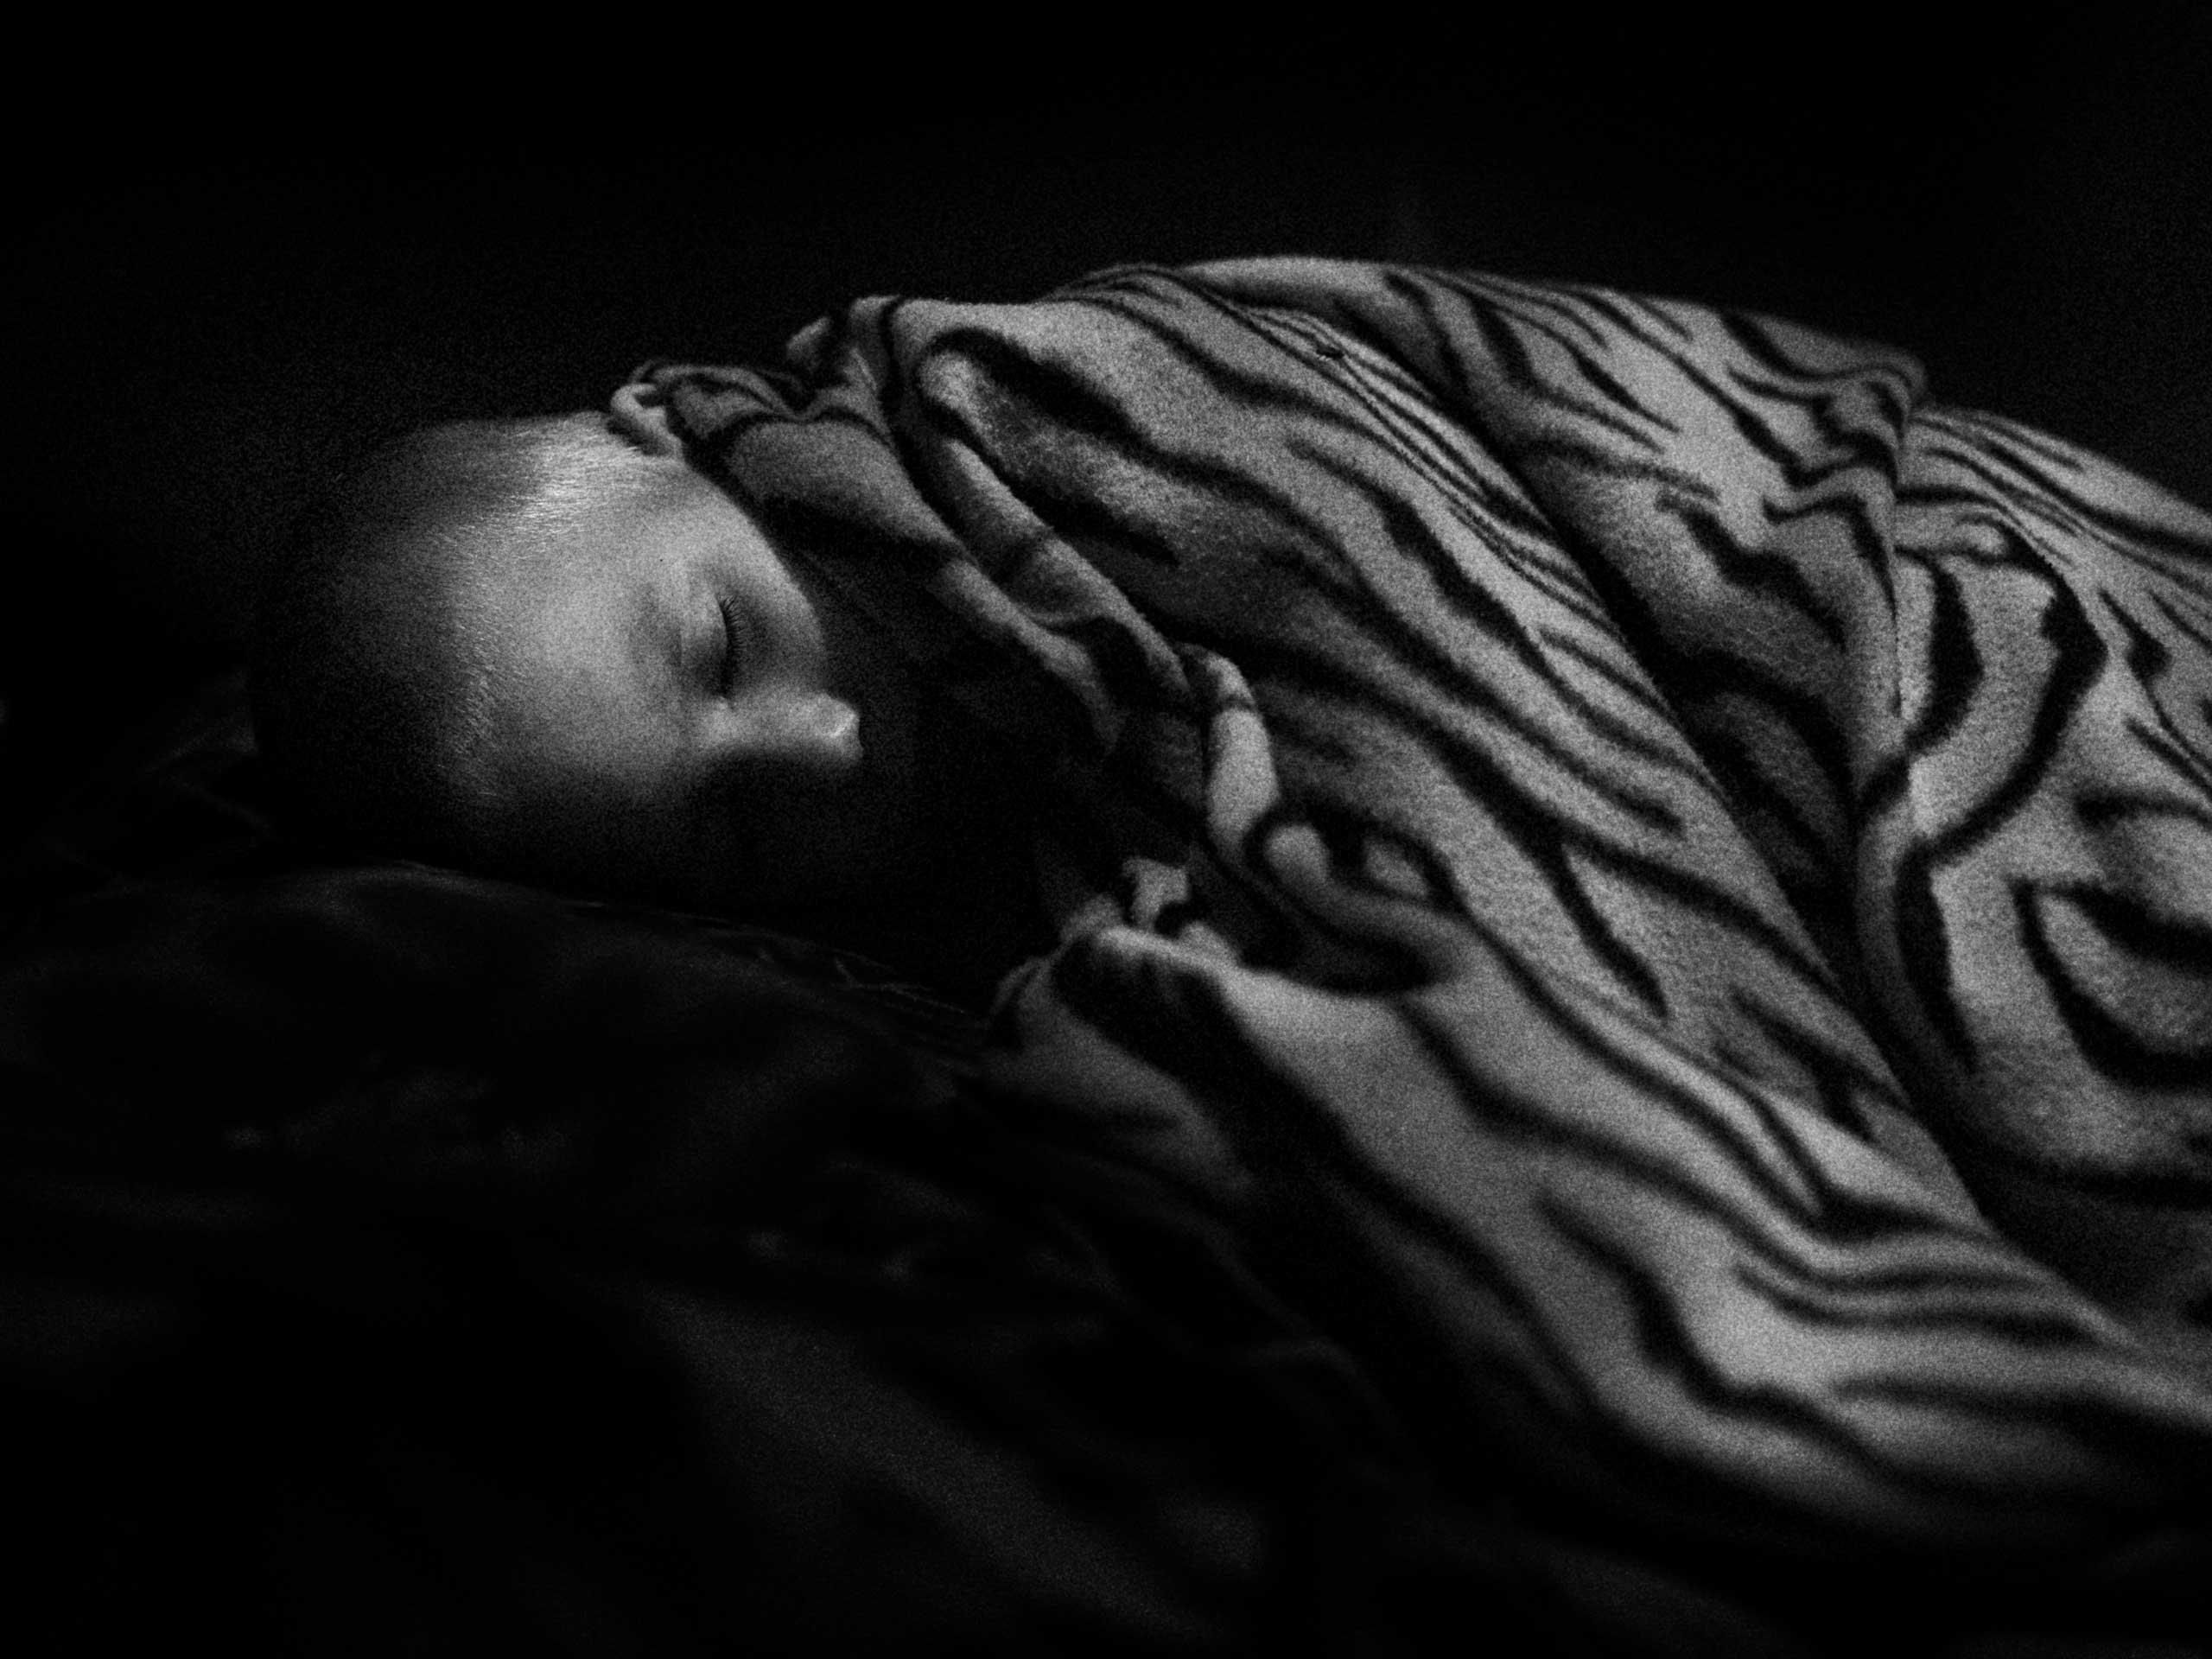 TIME LightBox: Notes From Underground A child sleeps during the afternoon in the Trudovski shelter. Trudovski, Donetsk Oblast, Ukraine. Oct. 18, 2014.